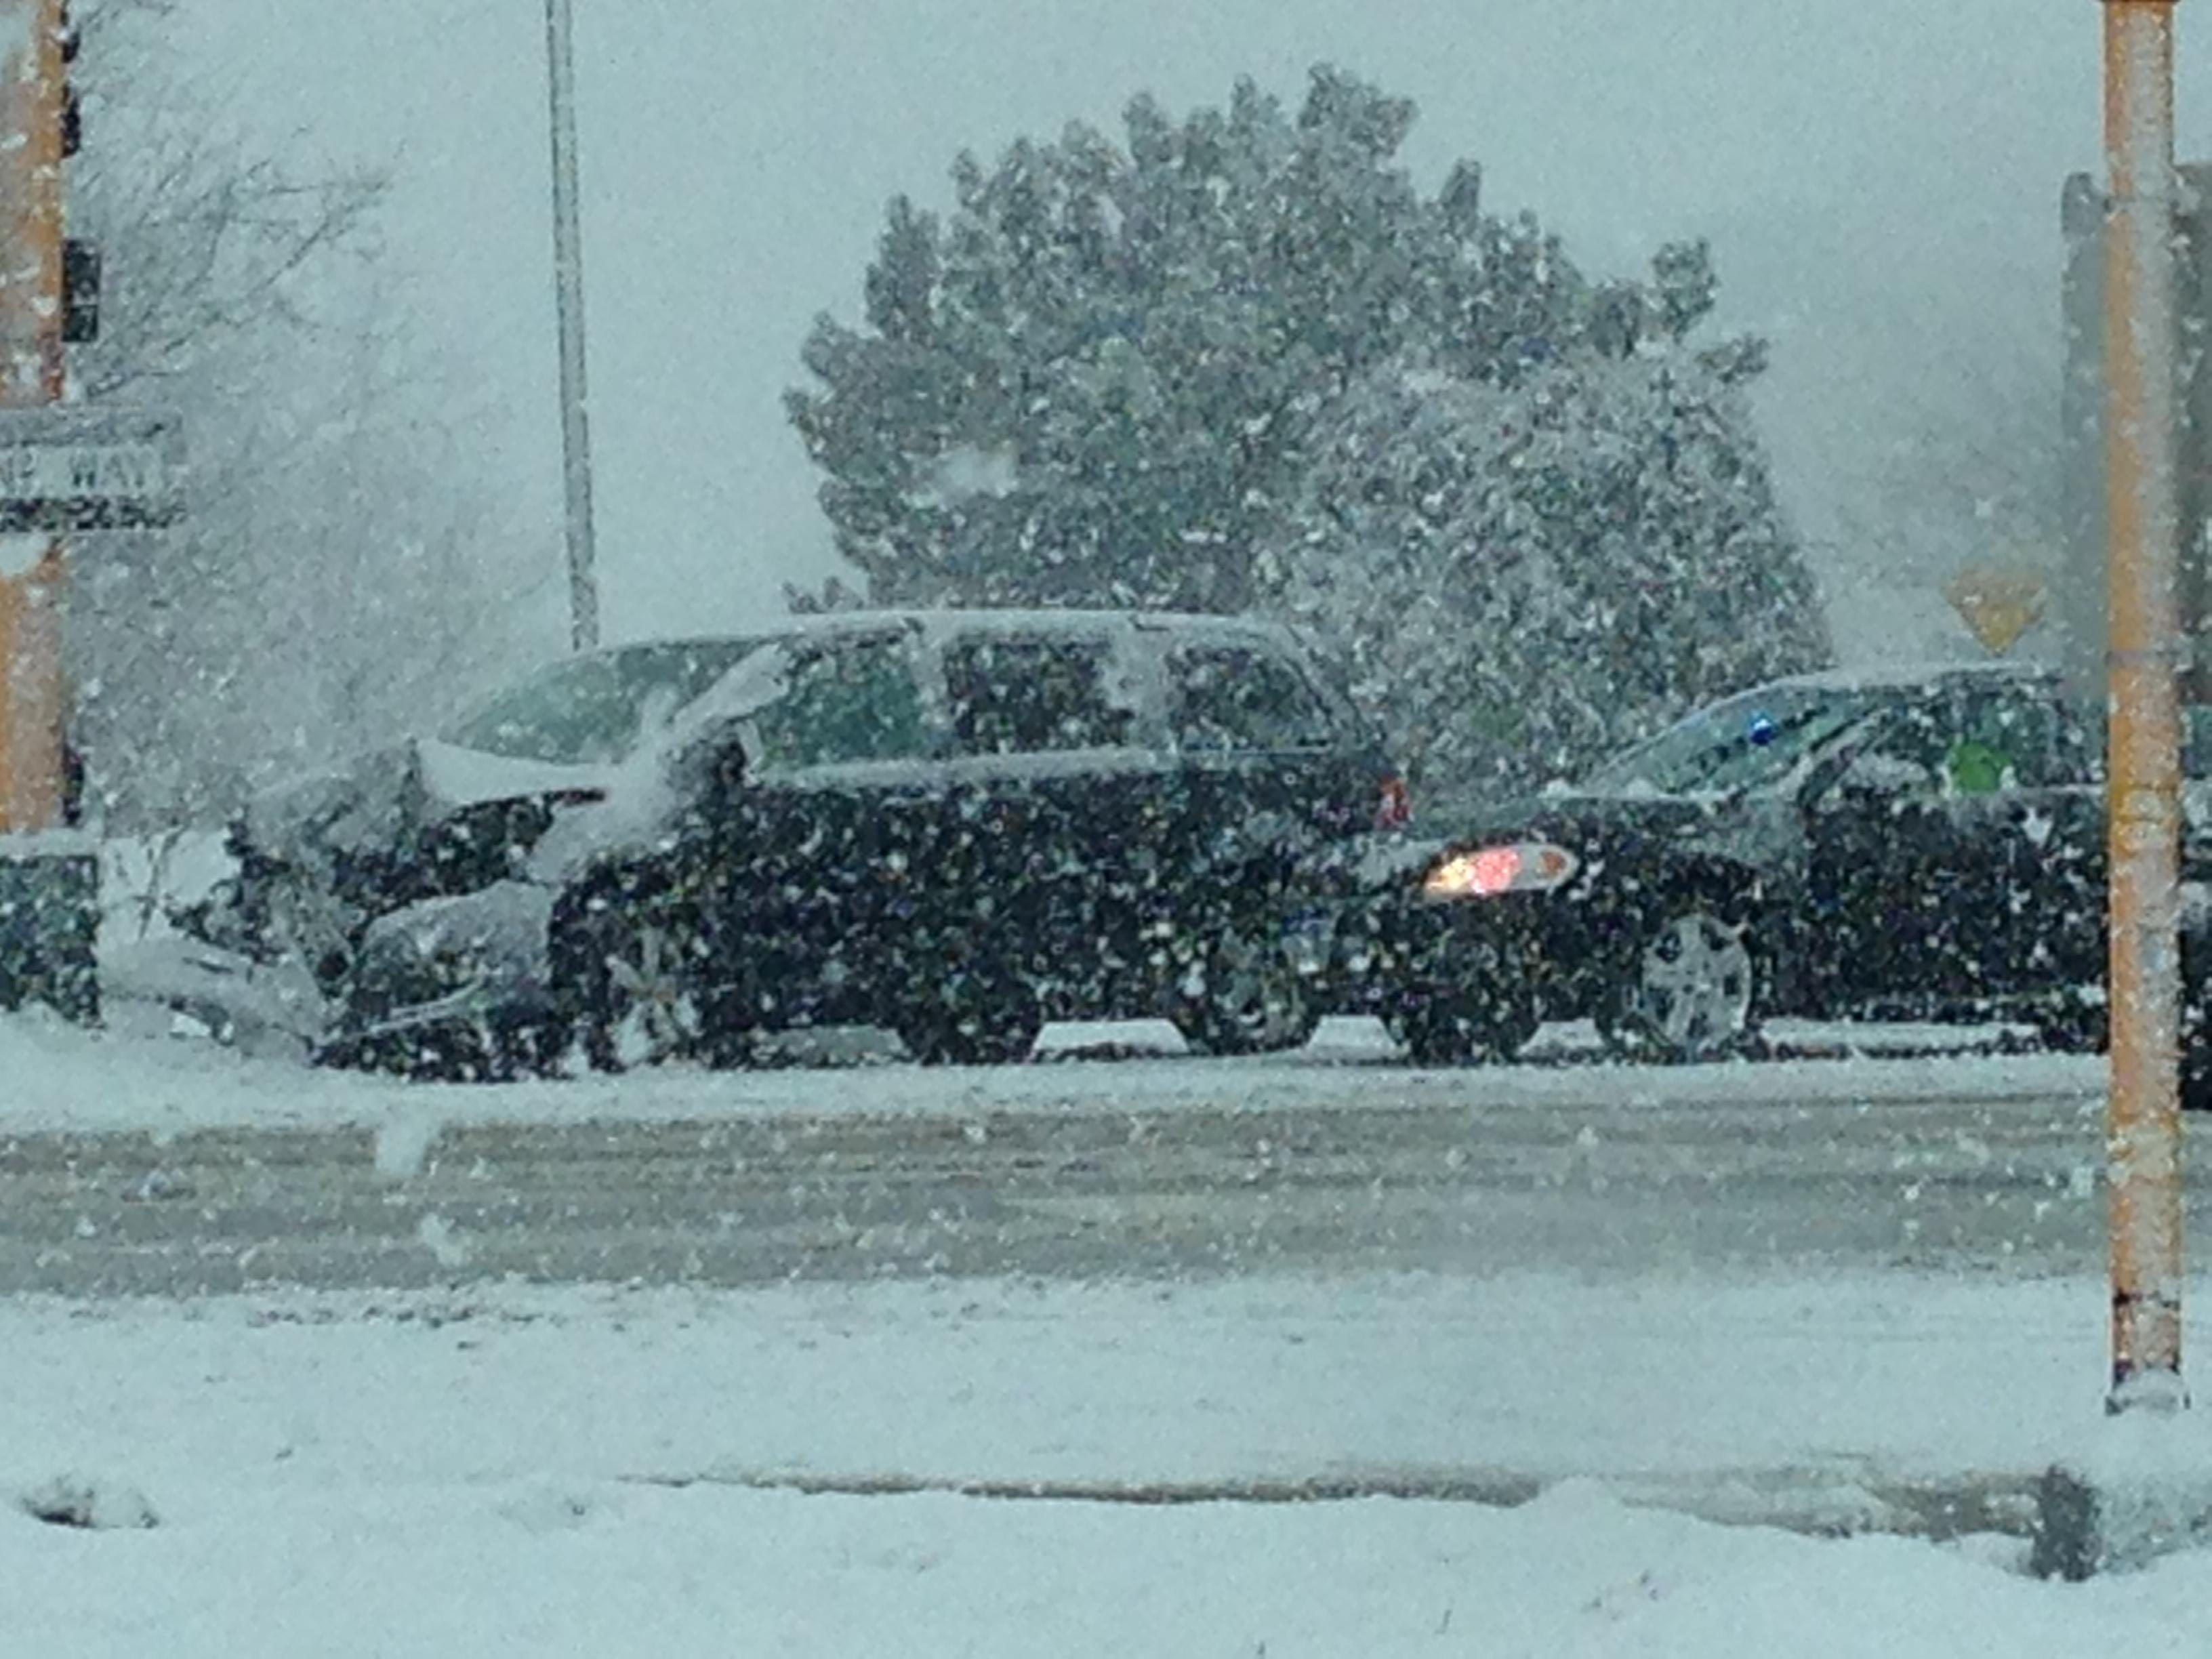 Crash - Minnesota winter storm - OSI Physical Therapy 1